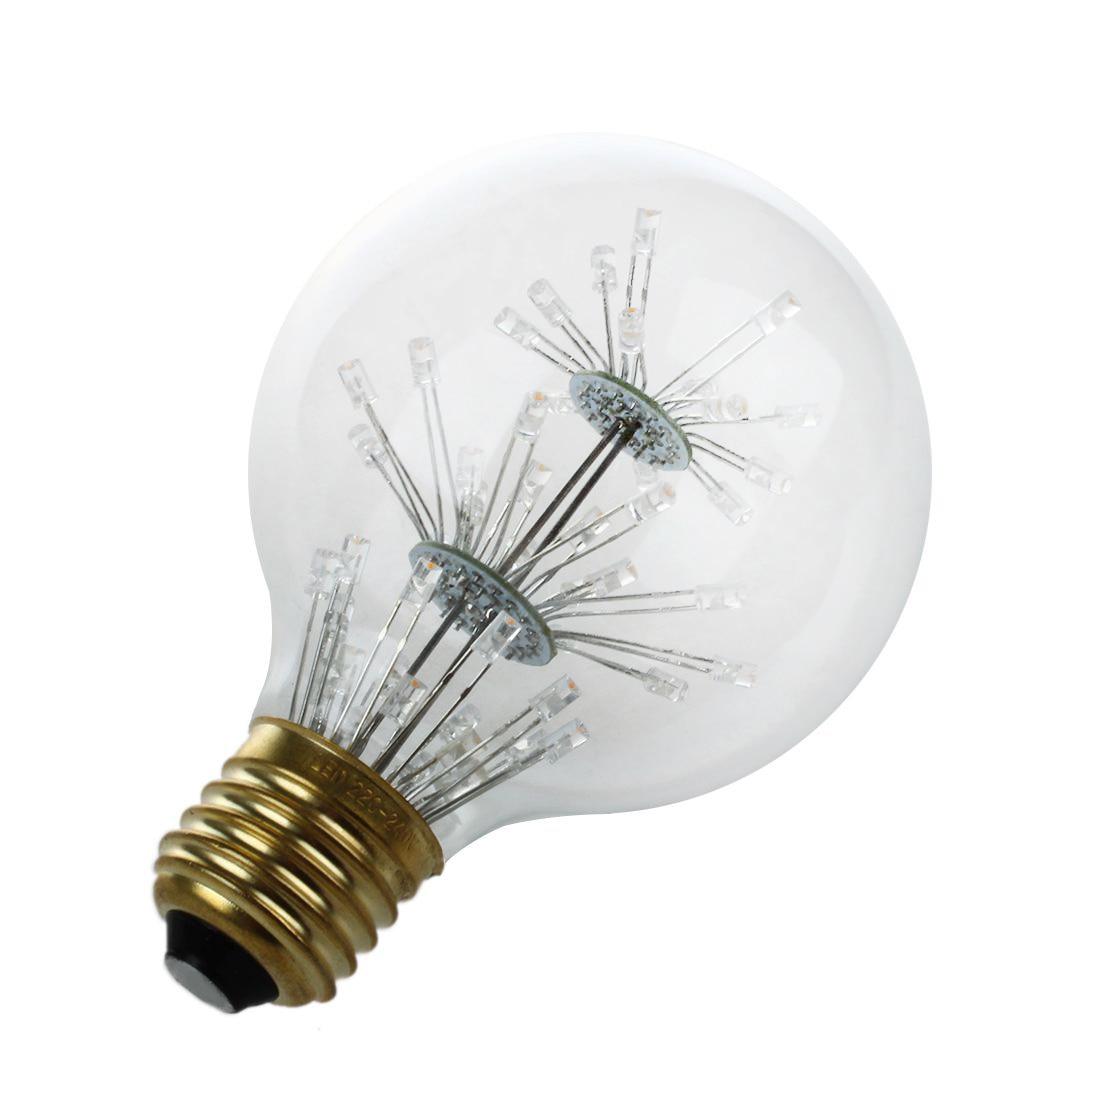 Edison Bulbs 4 Tier Led Vintage Light Bulb: Aliexpress.com : Buy CSS 3W 220V LED Light Edison Bulb